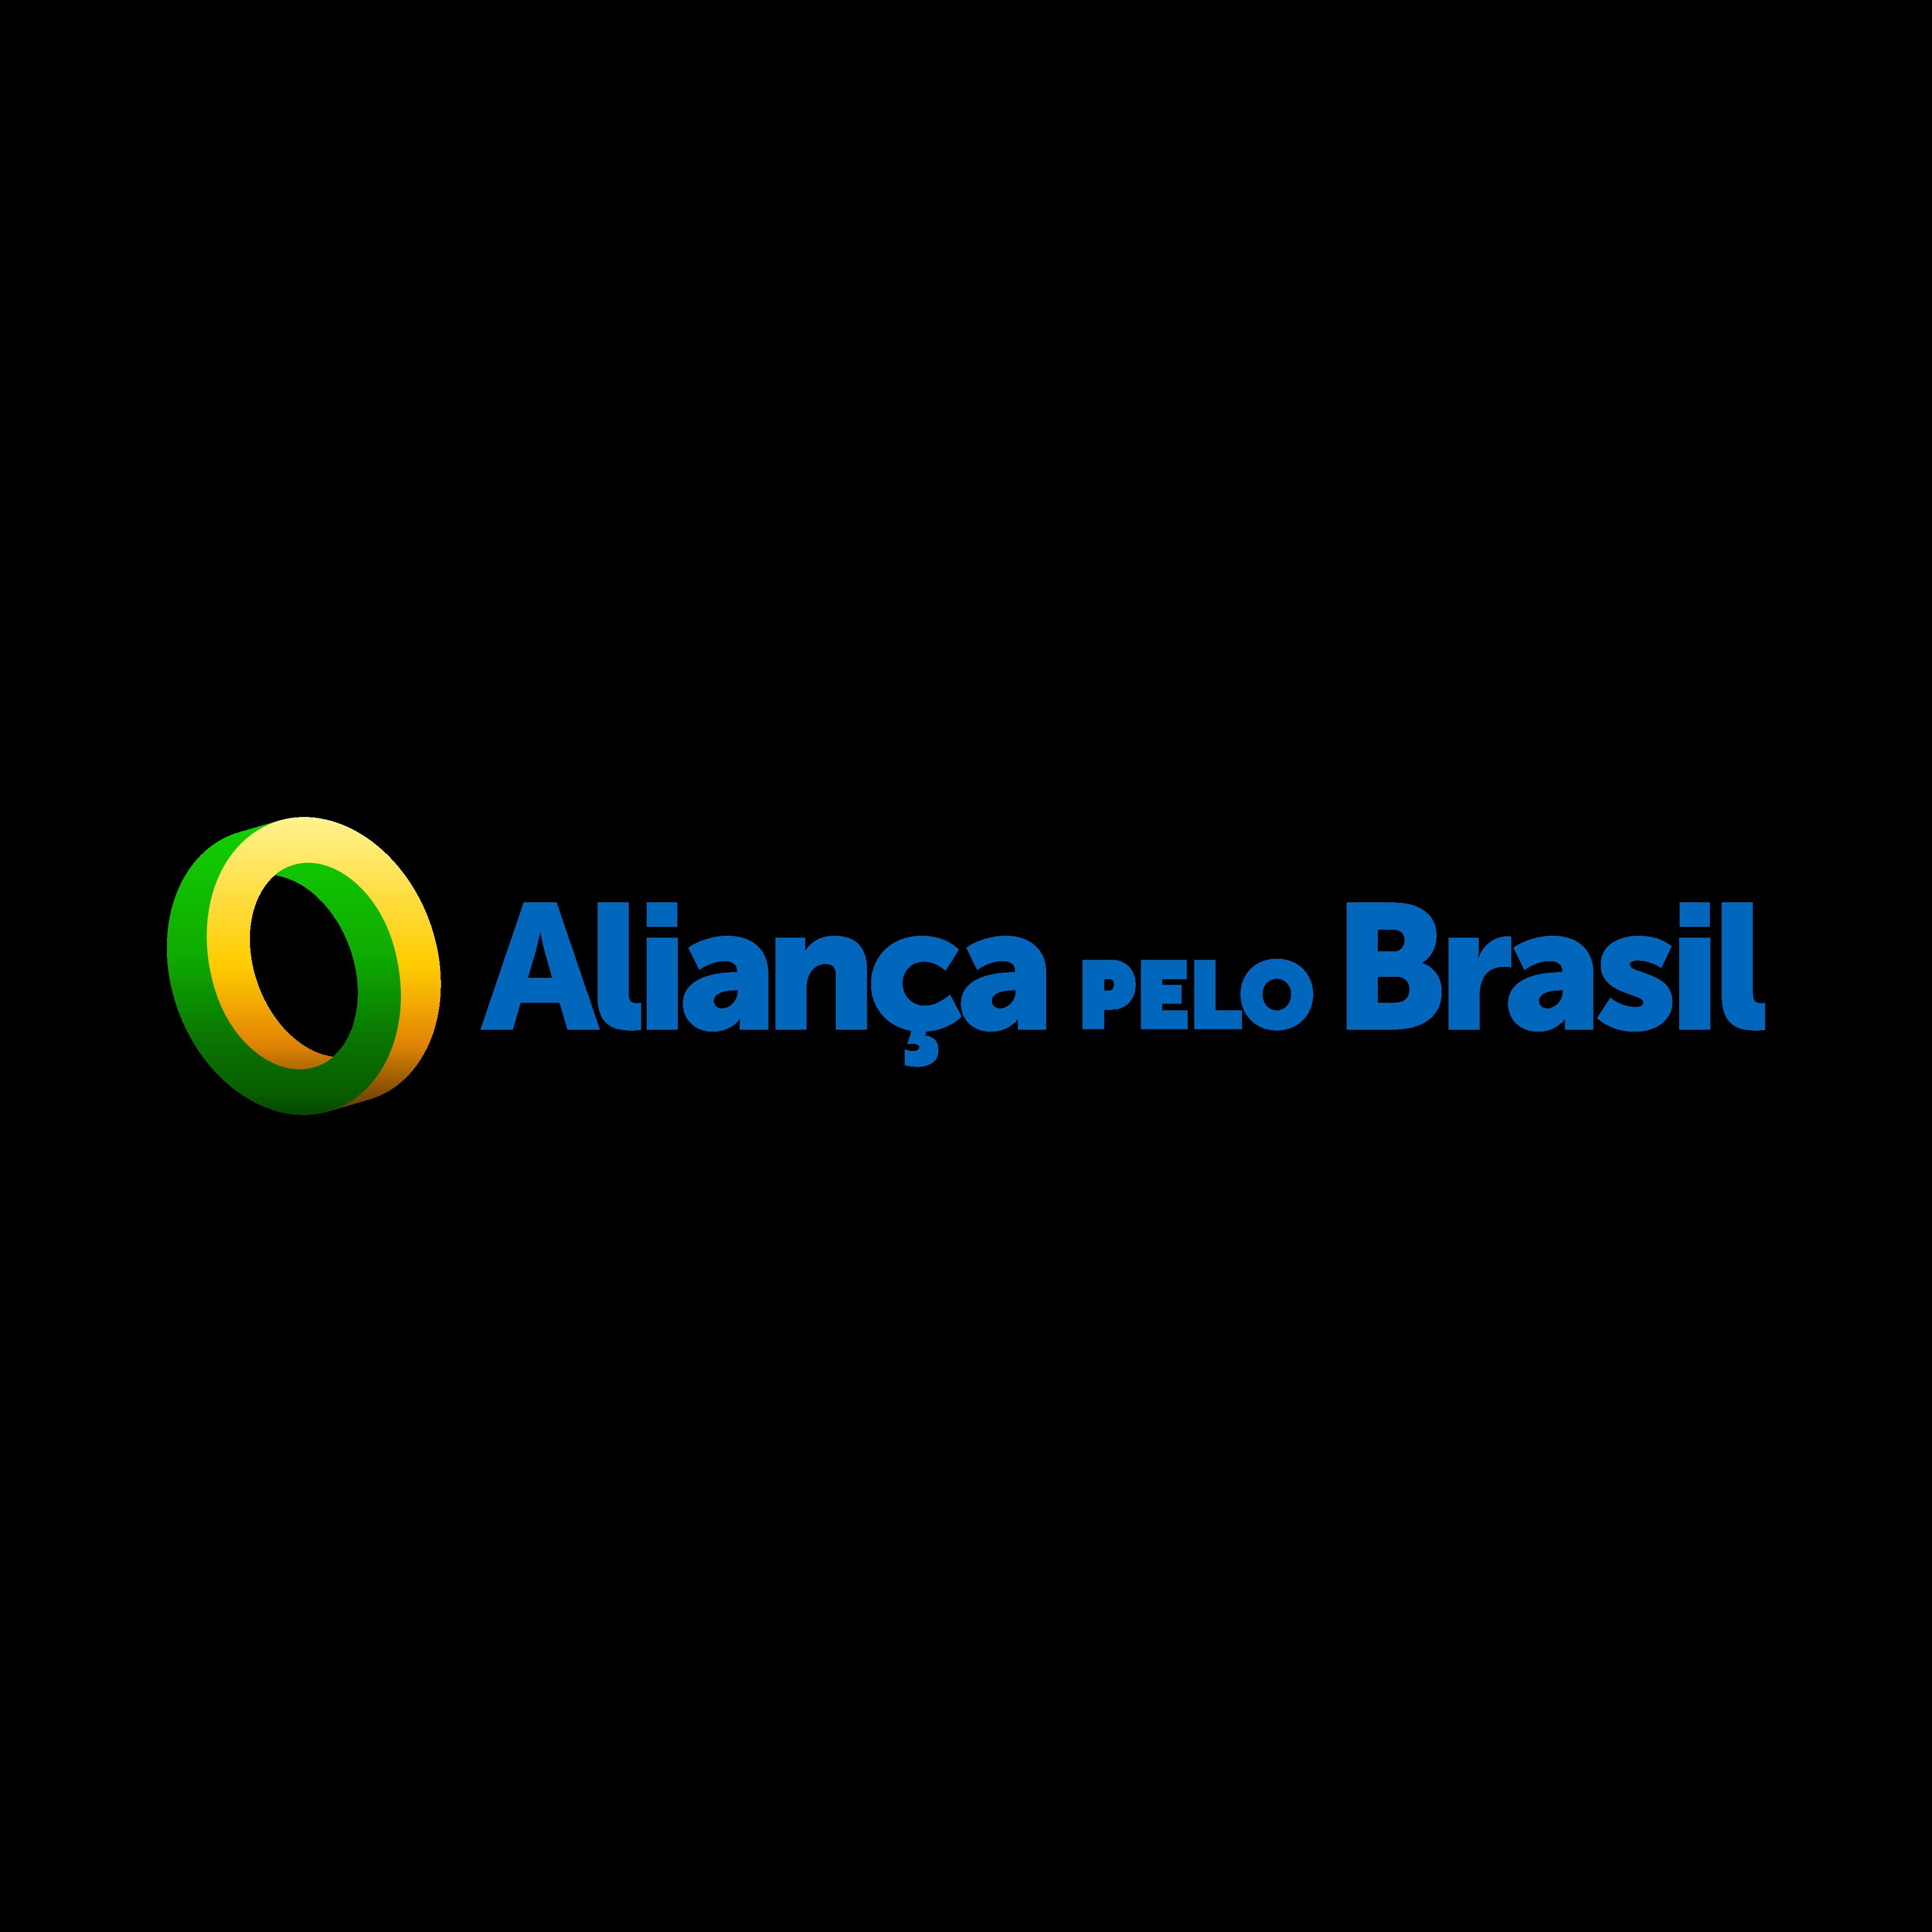 alianca pelo brasil logo 0 - Aliança Pelo Brasil Logo